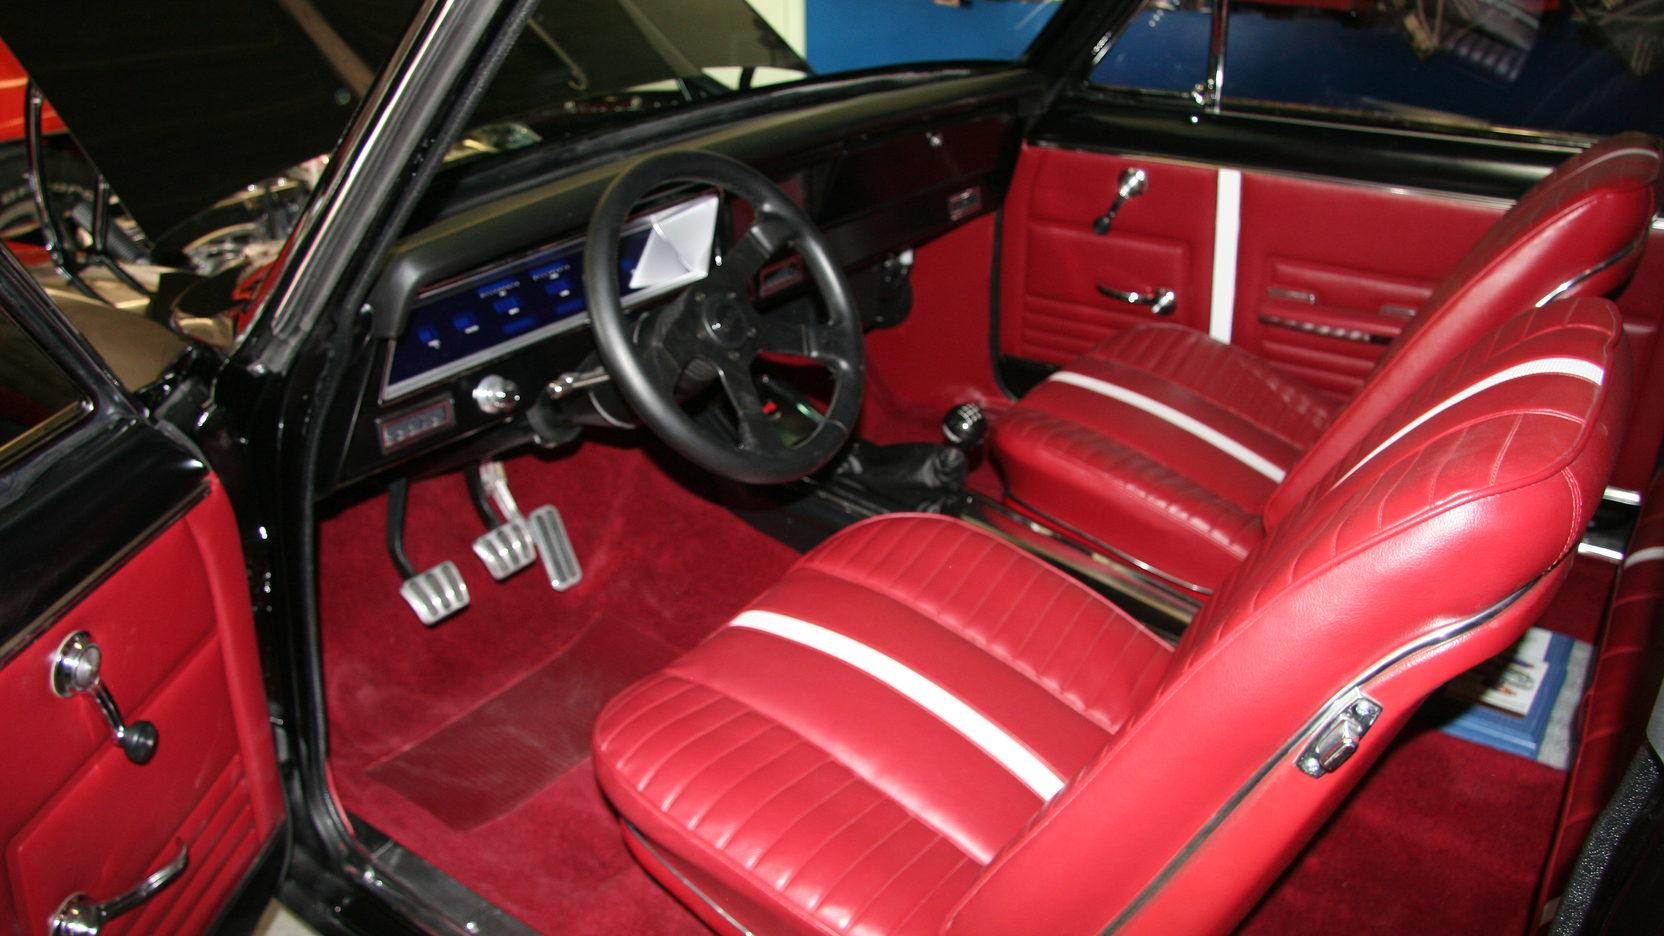 Pontiac G6 Headlight Fuse Box Location 2004 Vibe